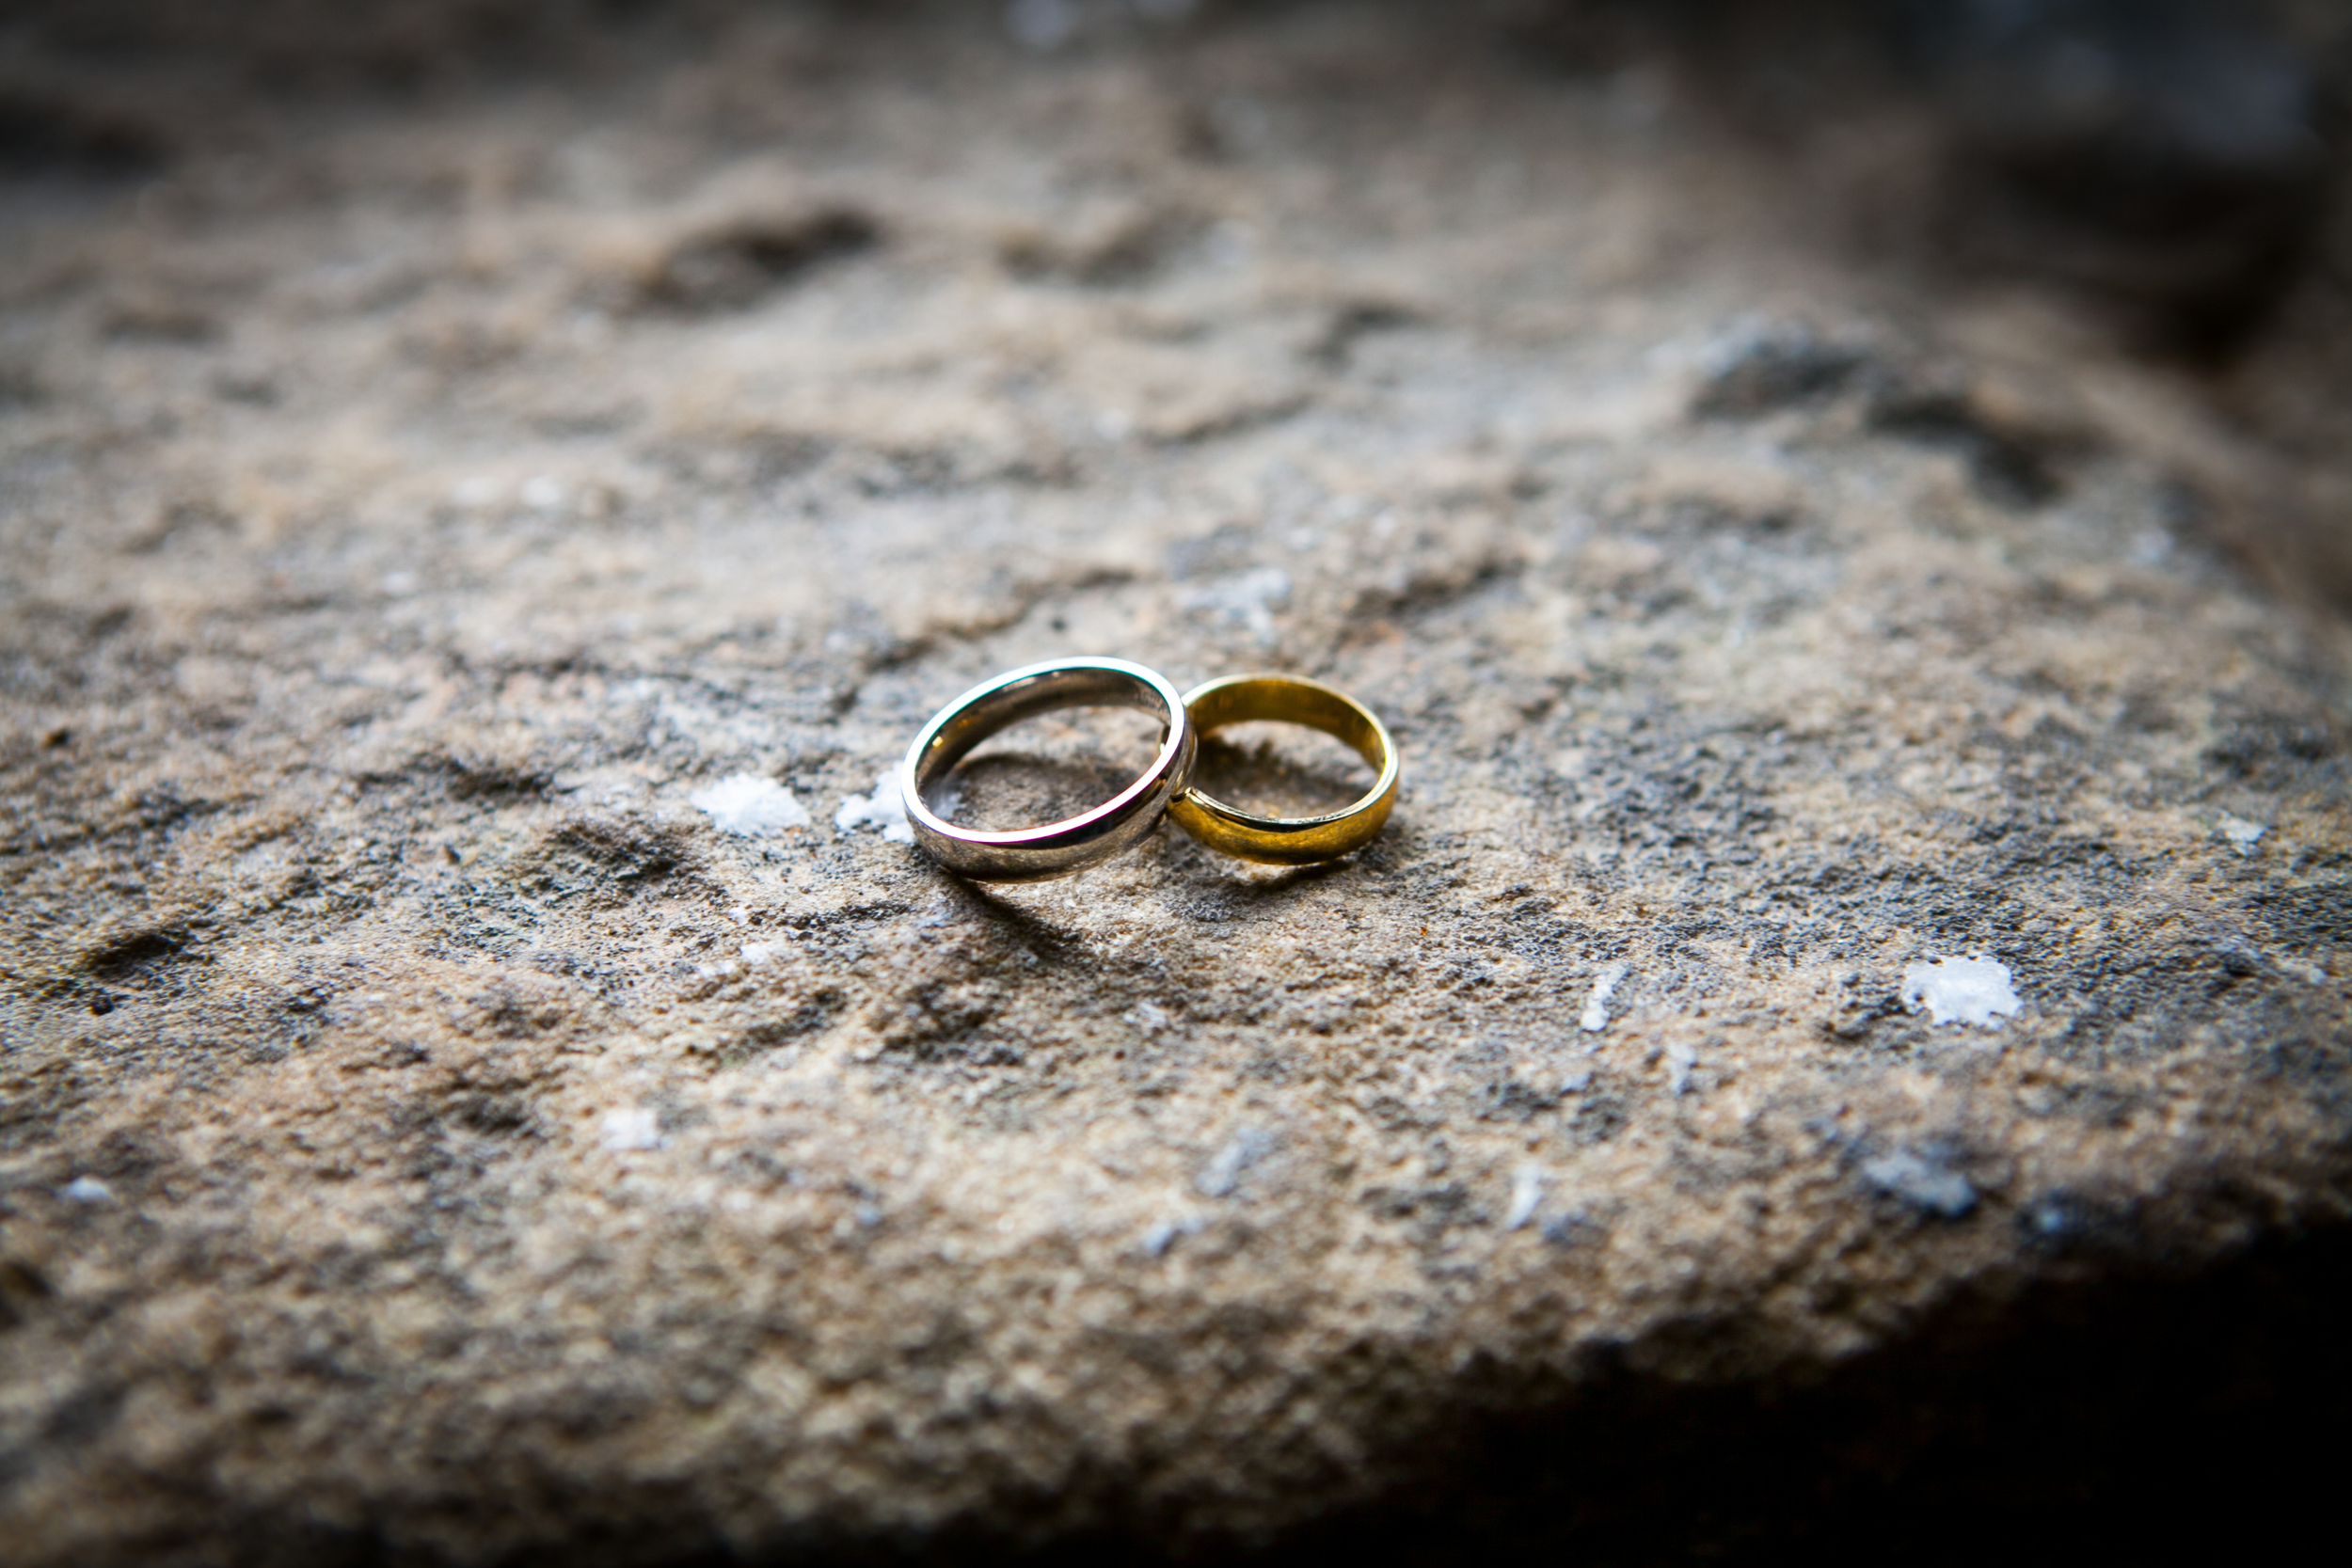 Mr & Mrs MacWhirter 26.10.12 @ Langley Castle, Northumberland